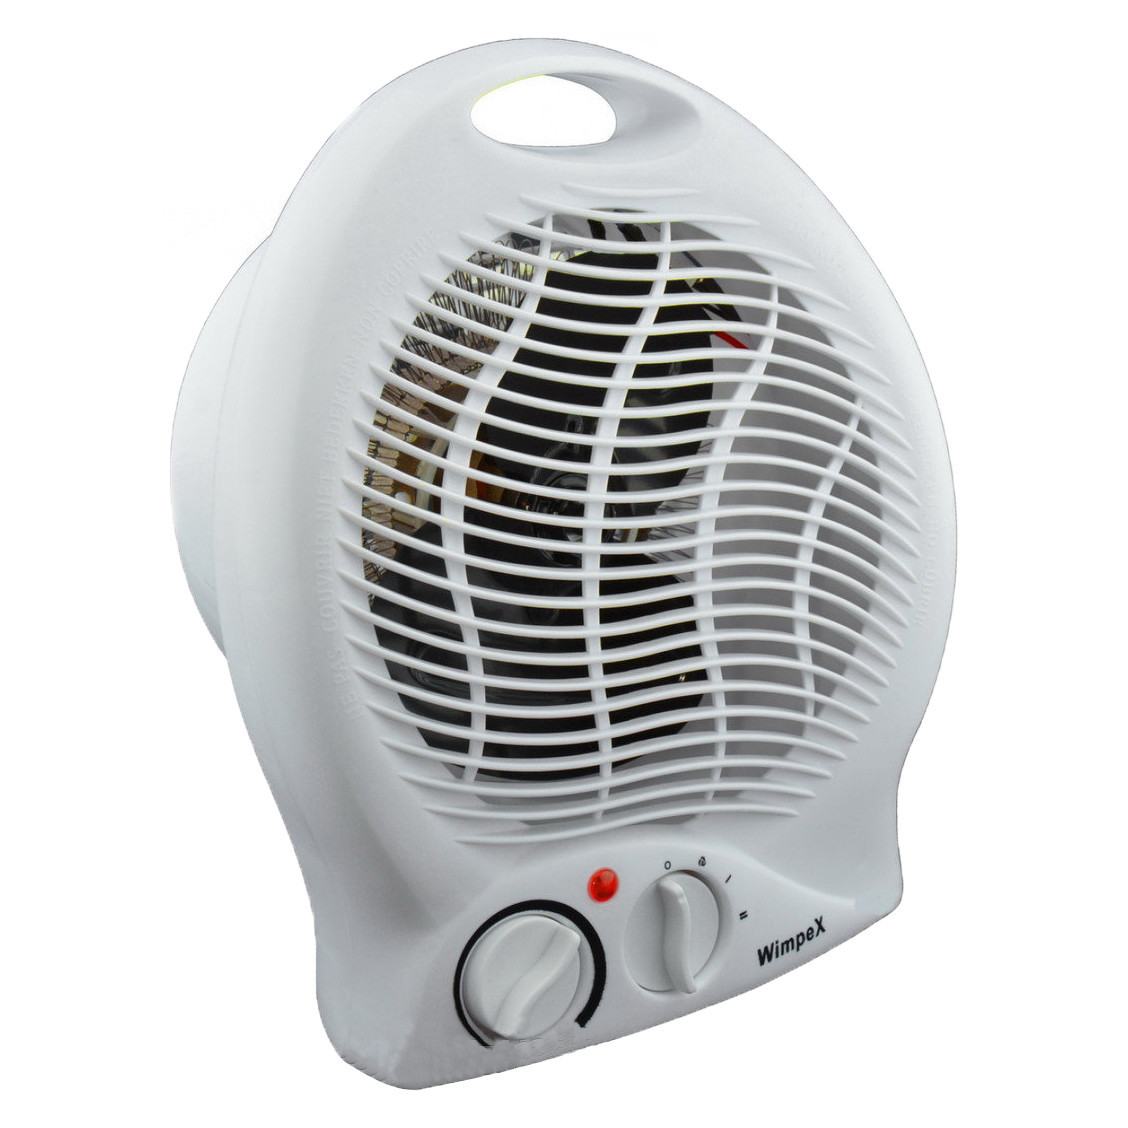 Тепловентилятор Wimpex Fan Heater WX-425 + ПОДАРОК